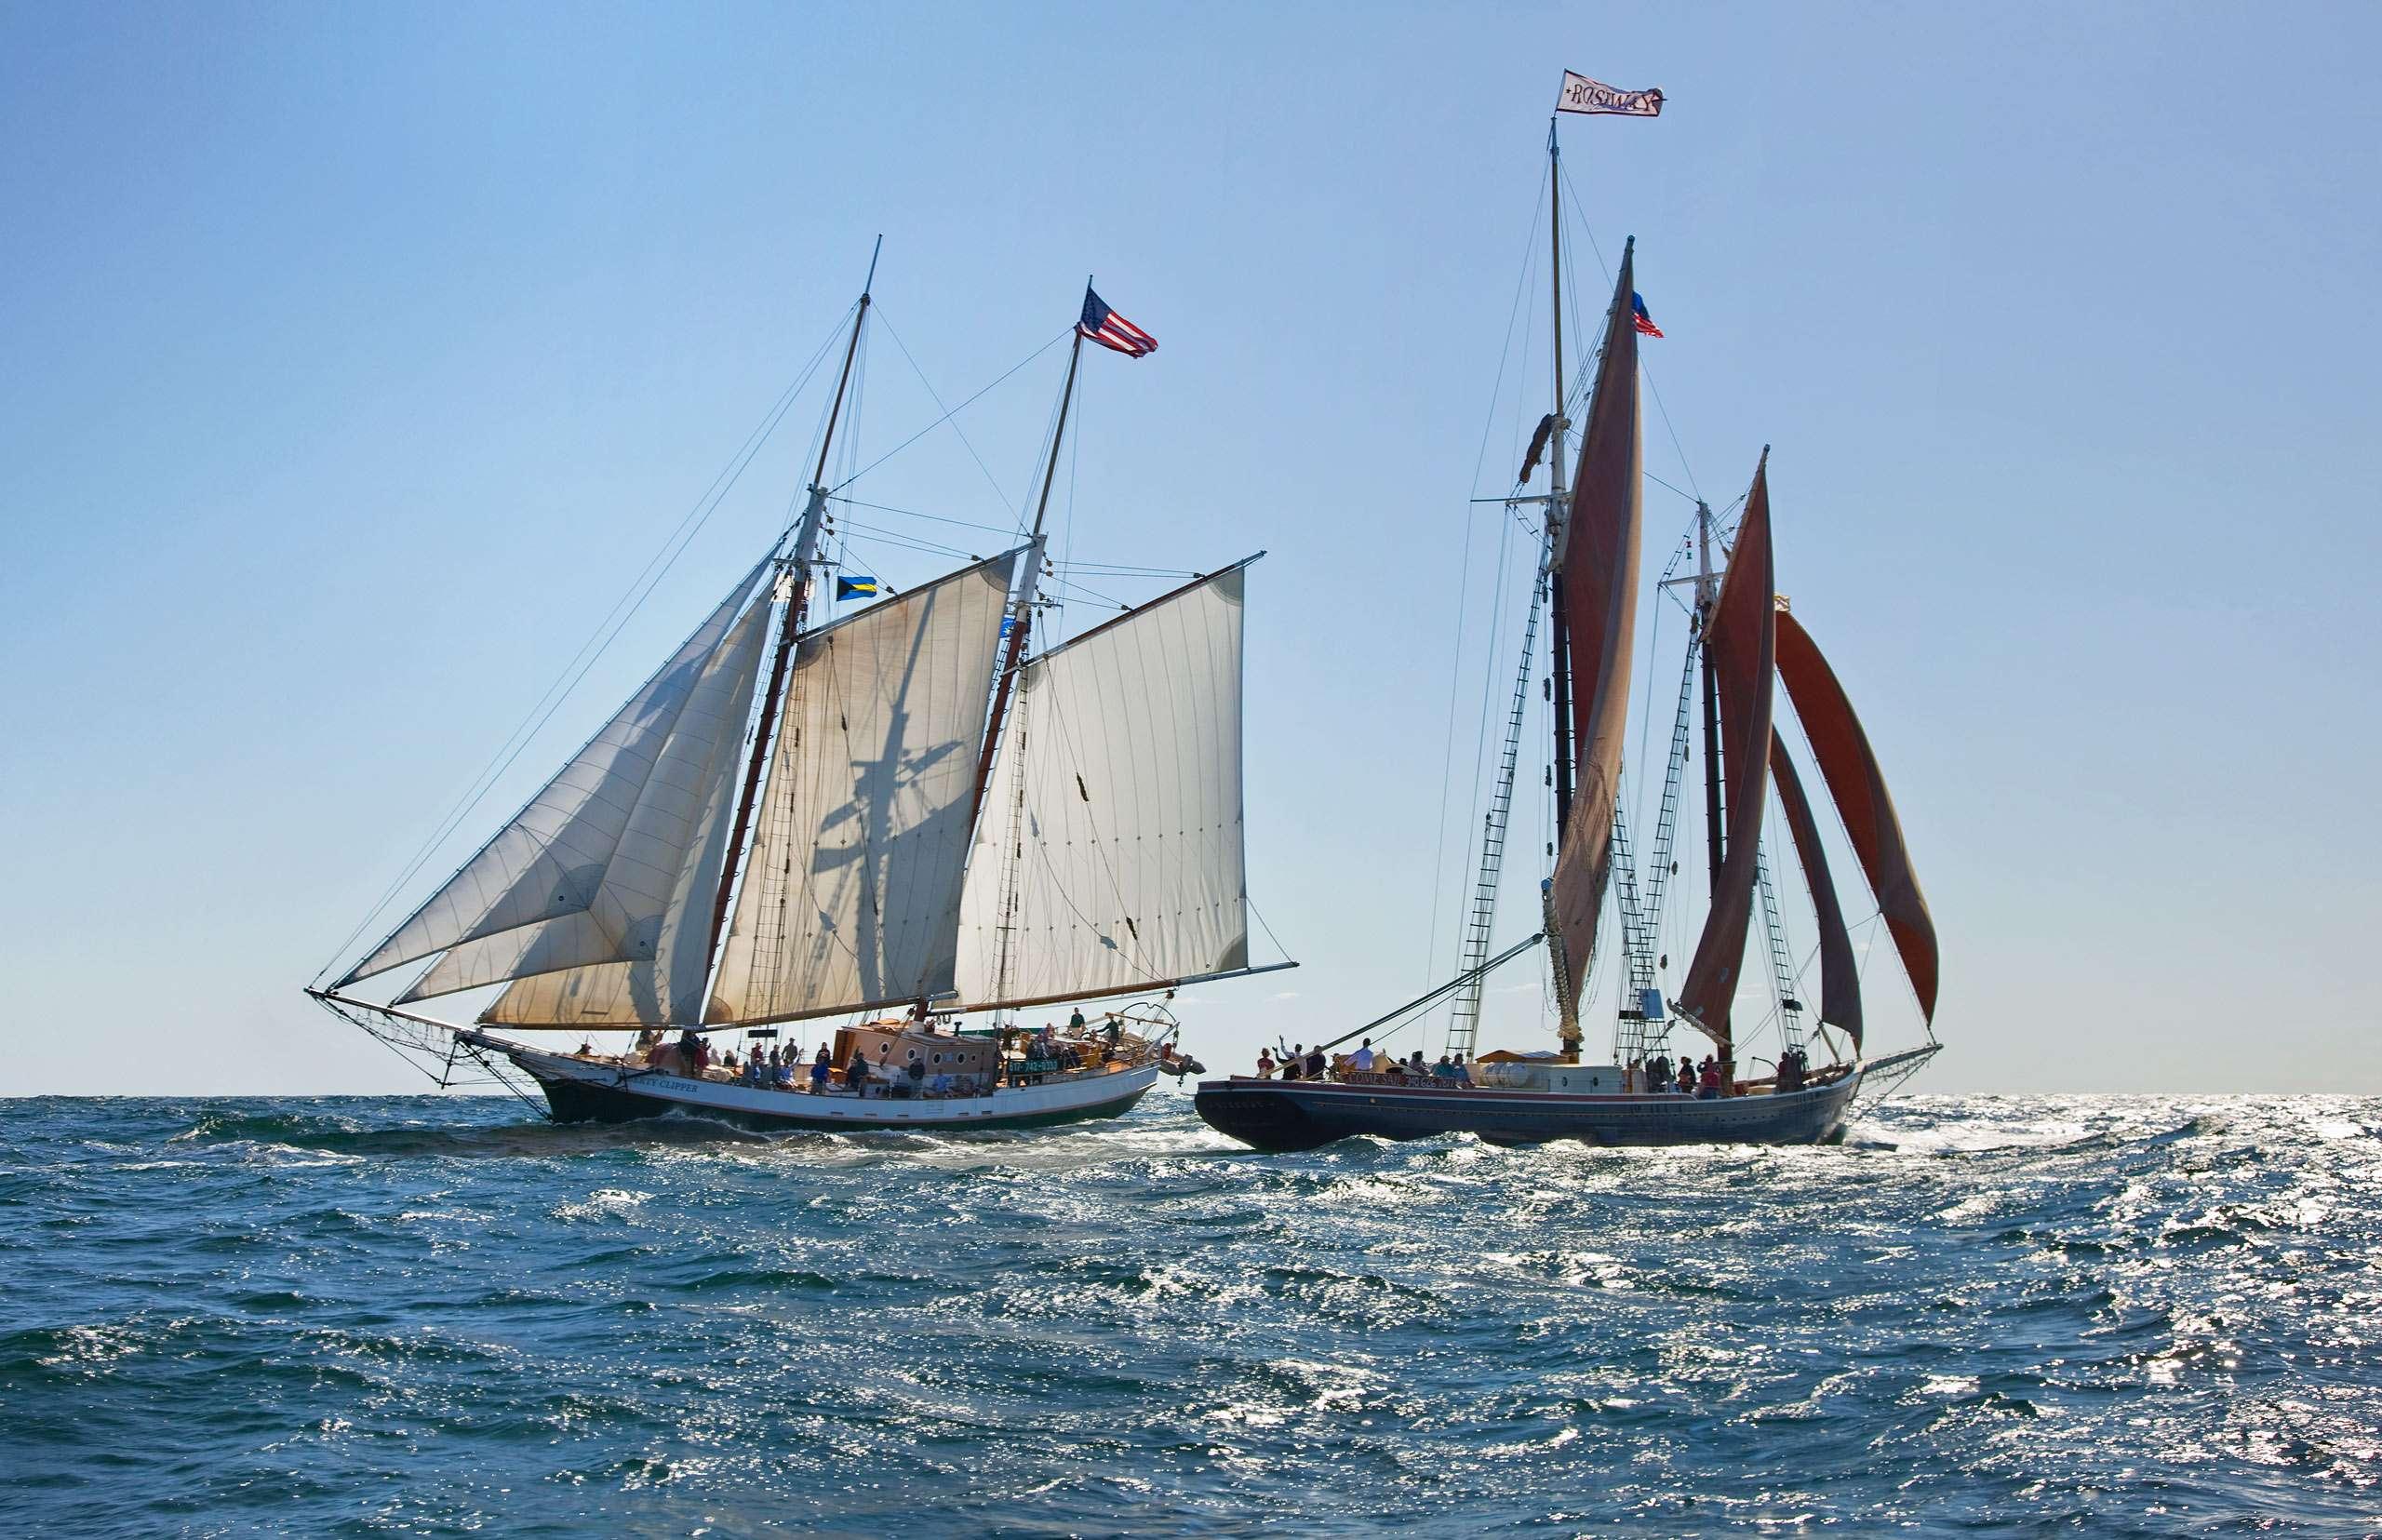 PORTFOLIO - Sailing - Windjammers #14   PCG446